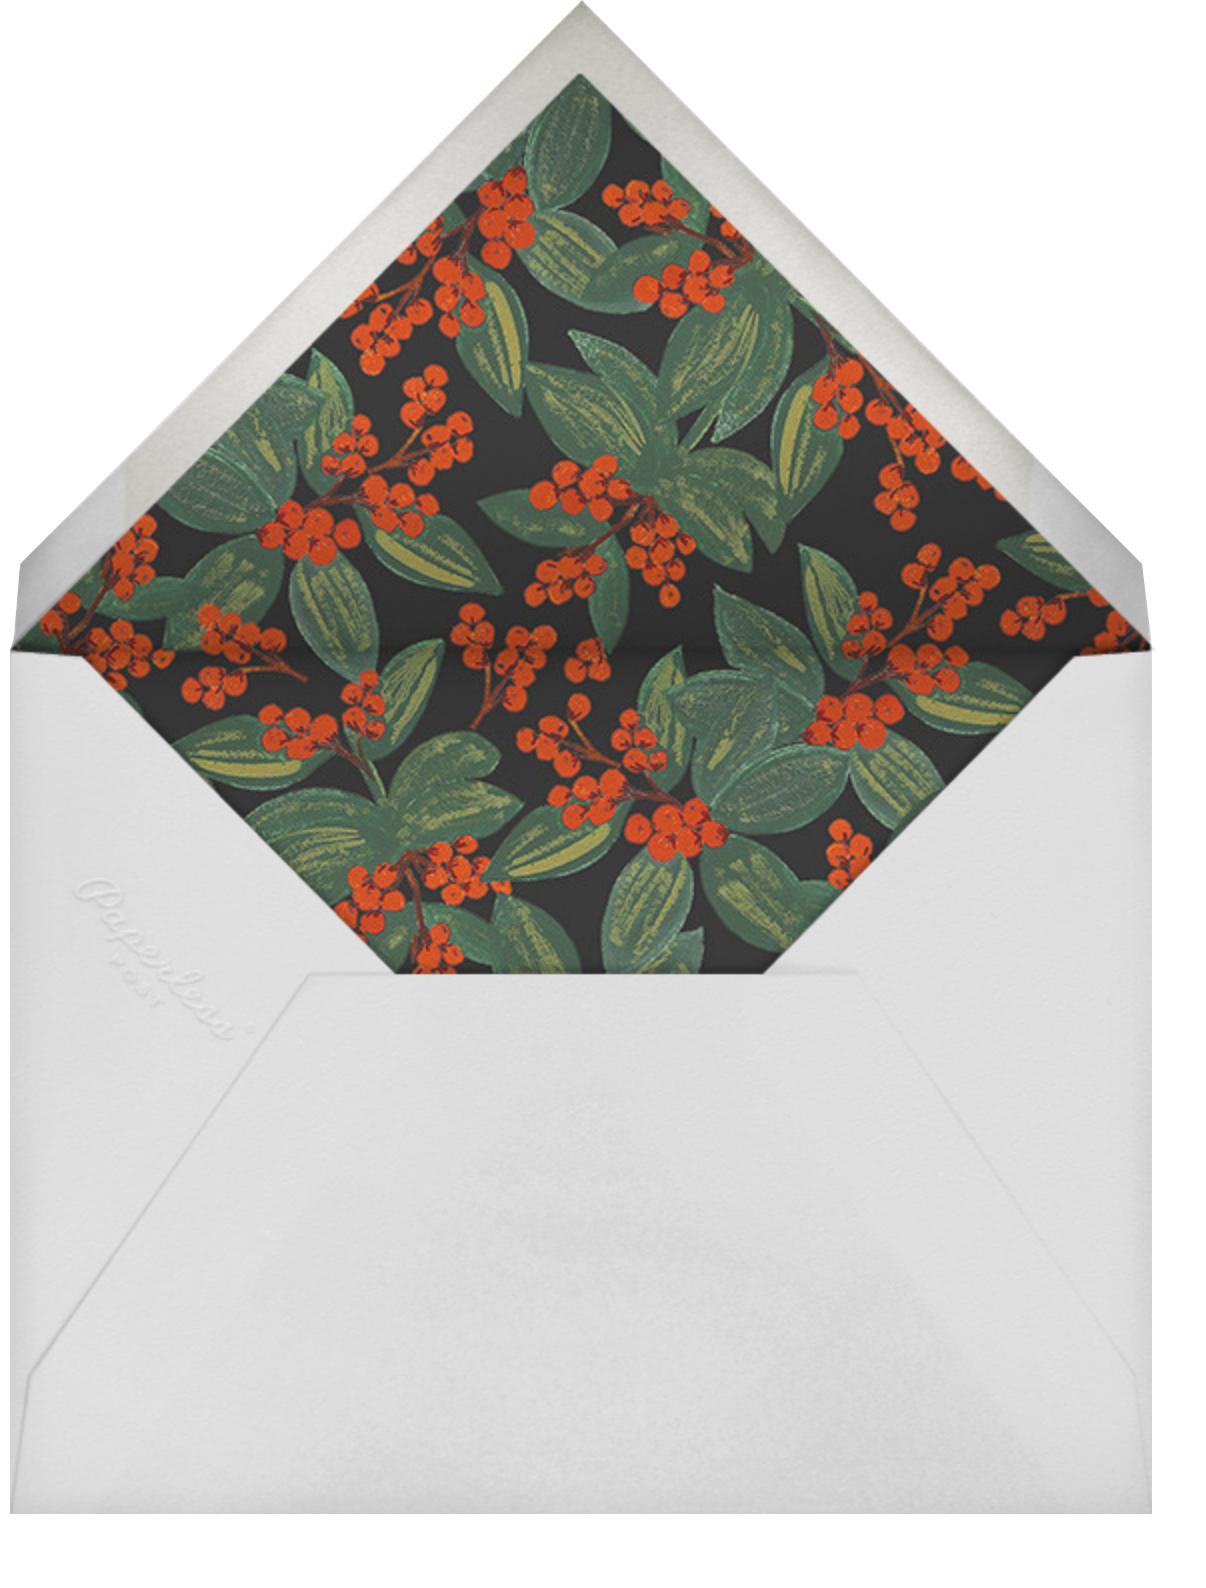 Winterberries Present - Rifle Paper Co. - Christmas - envelope back